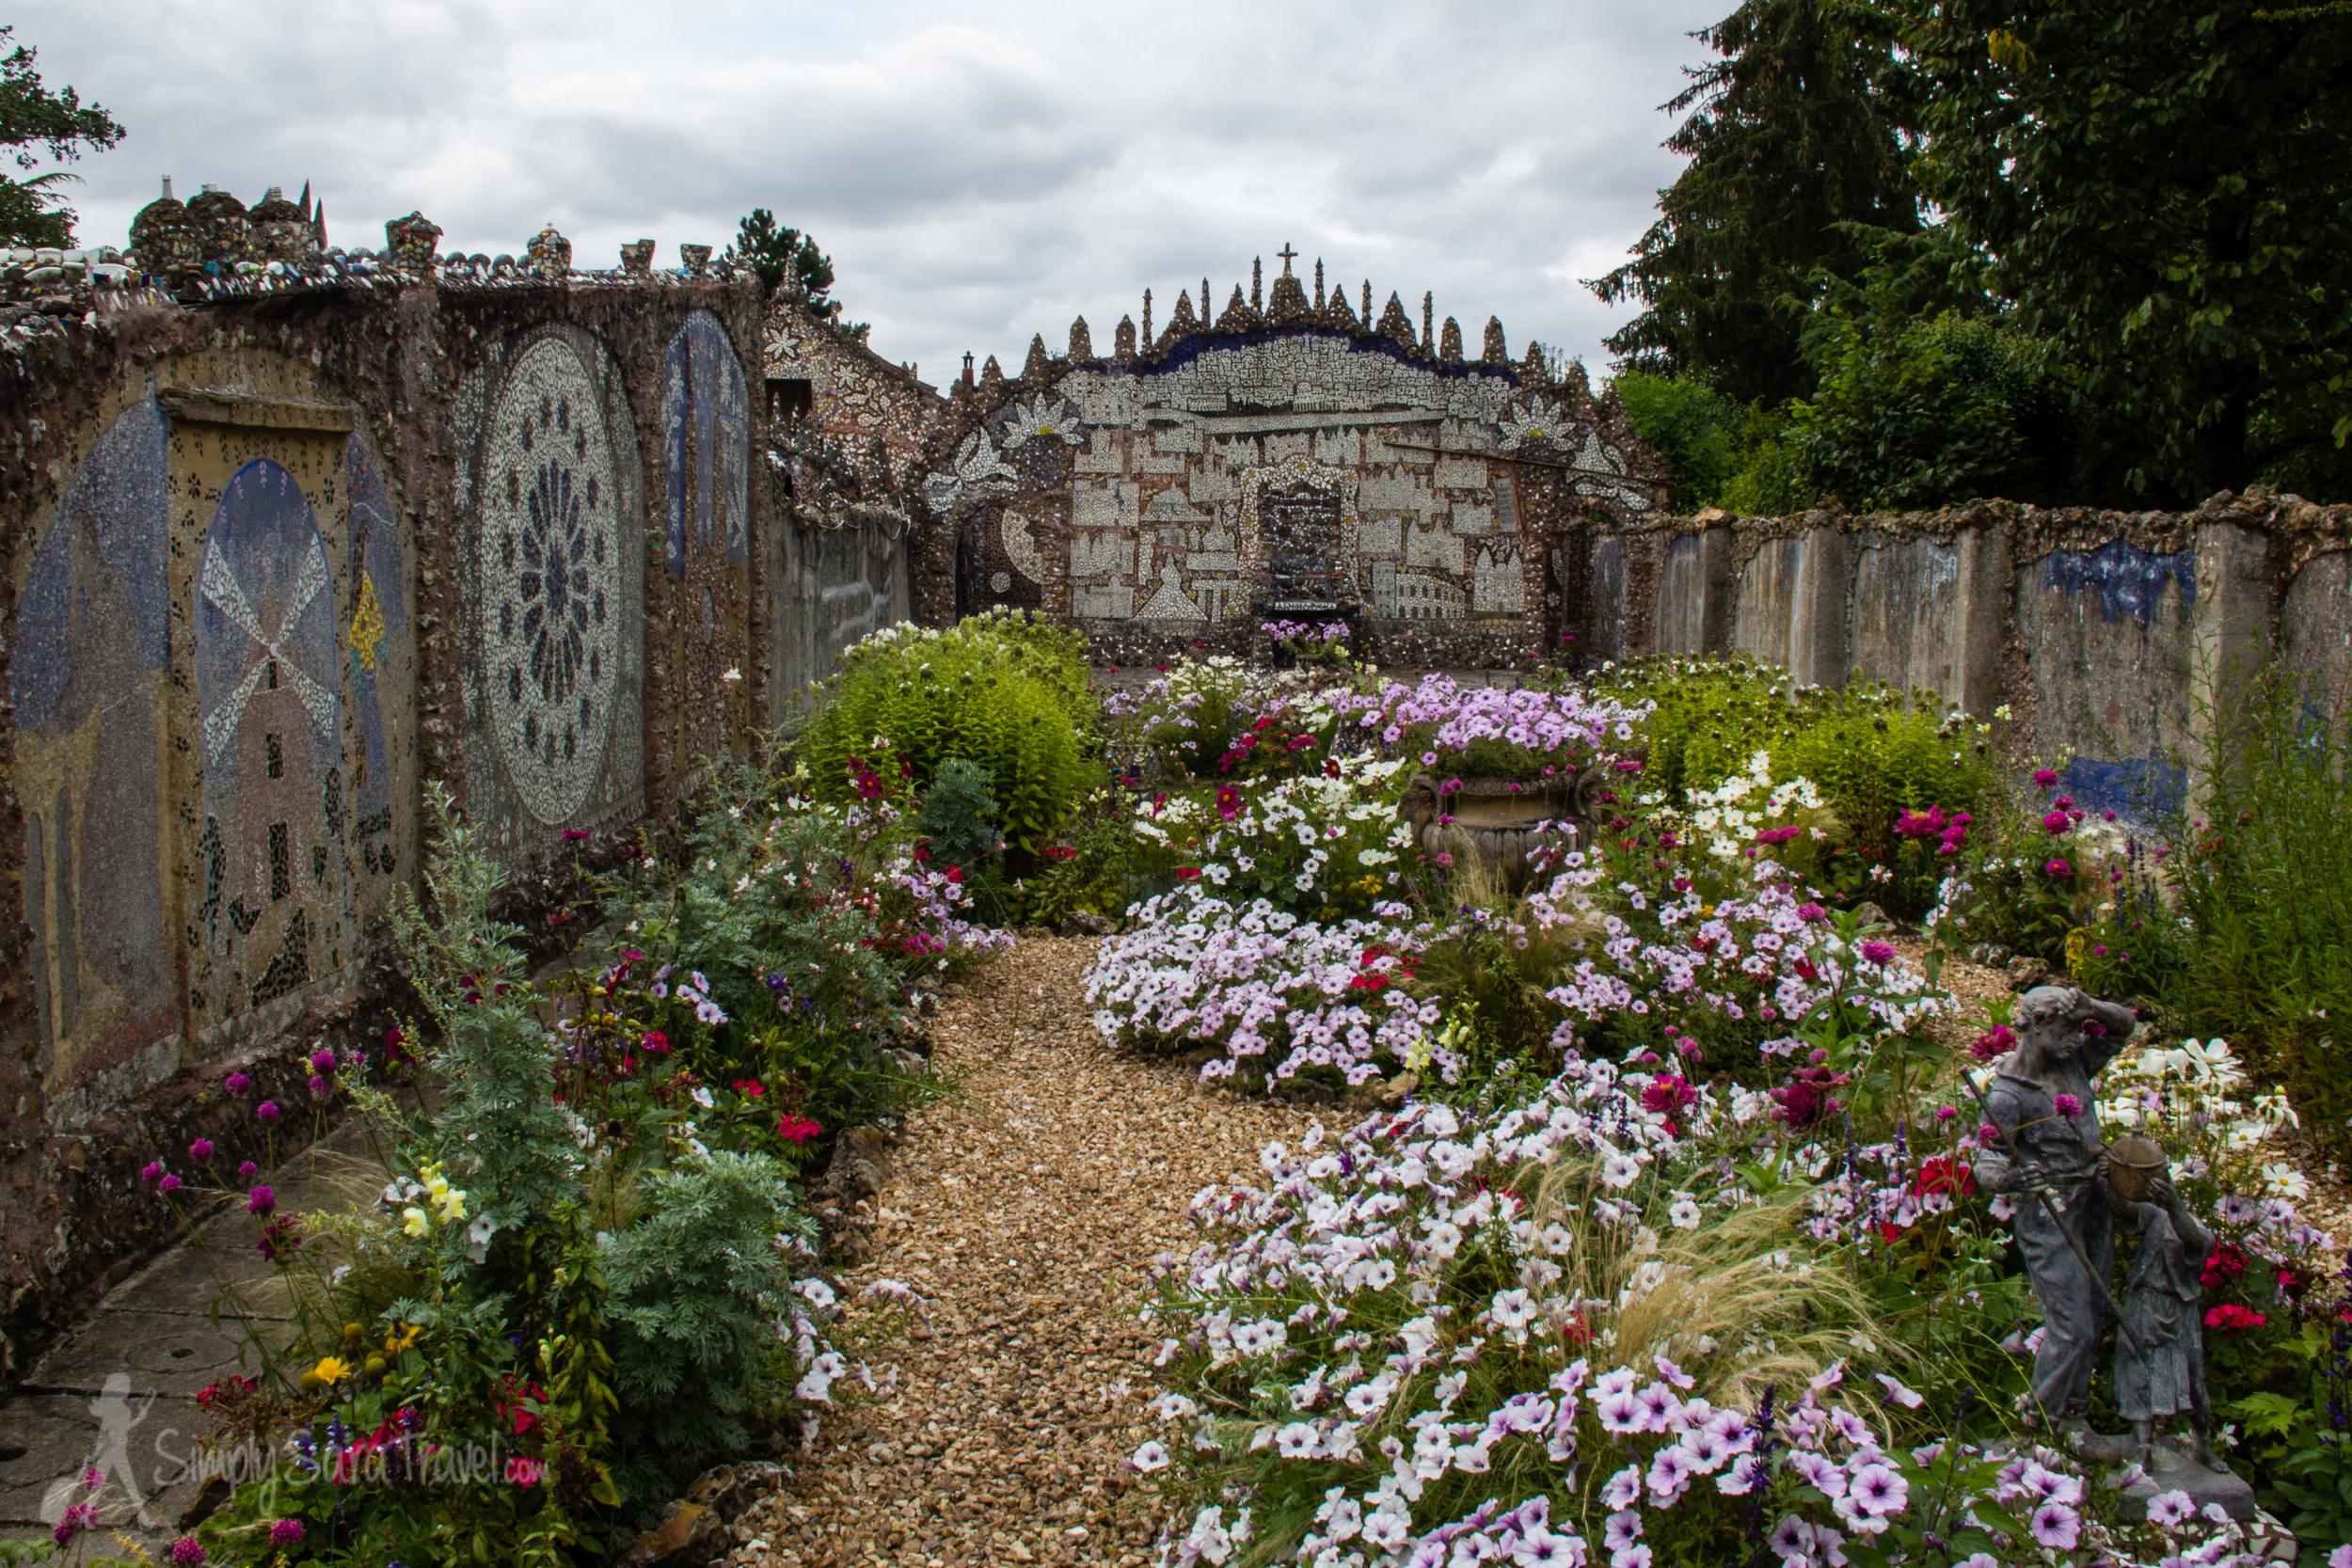 The garden of Maison Picassiette